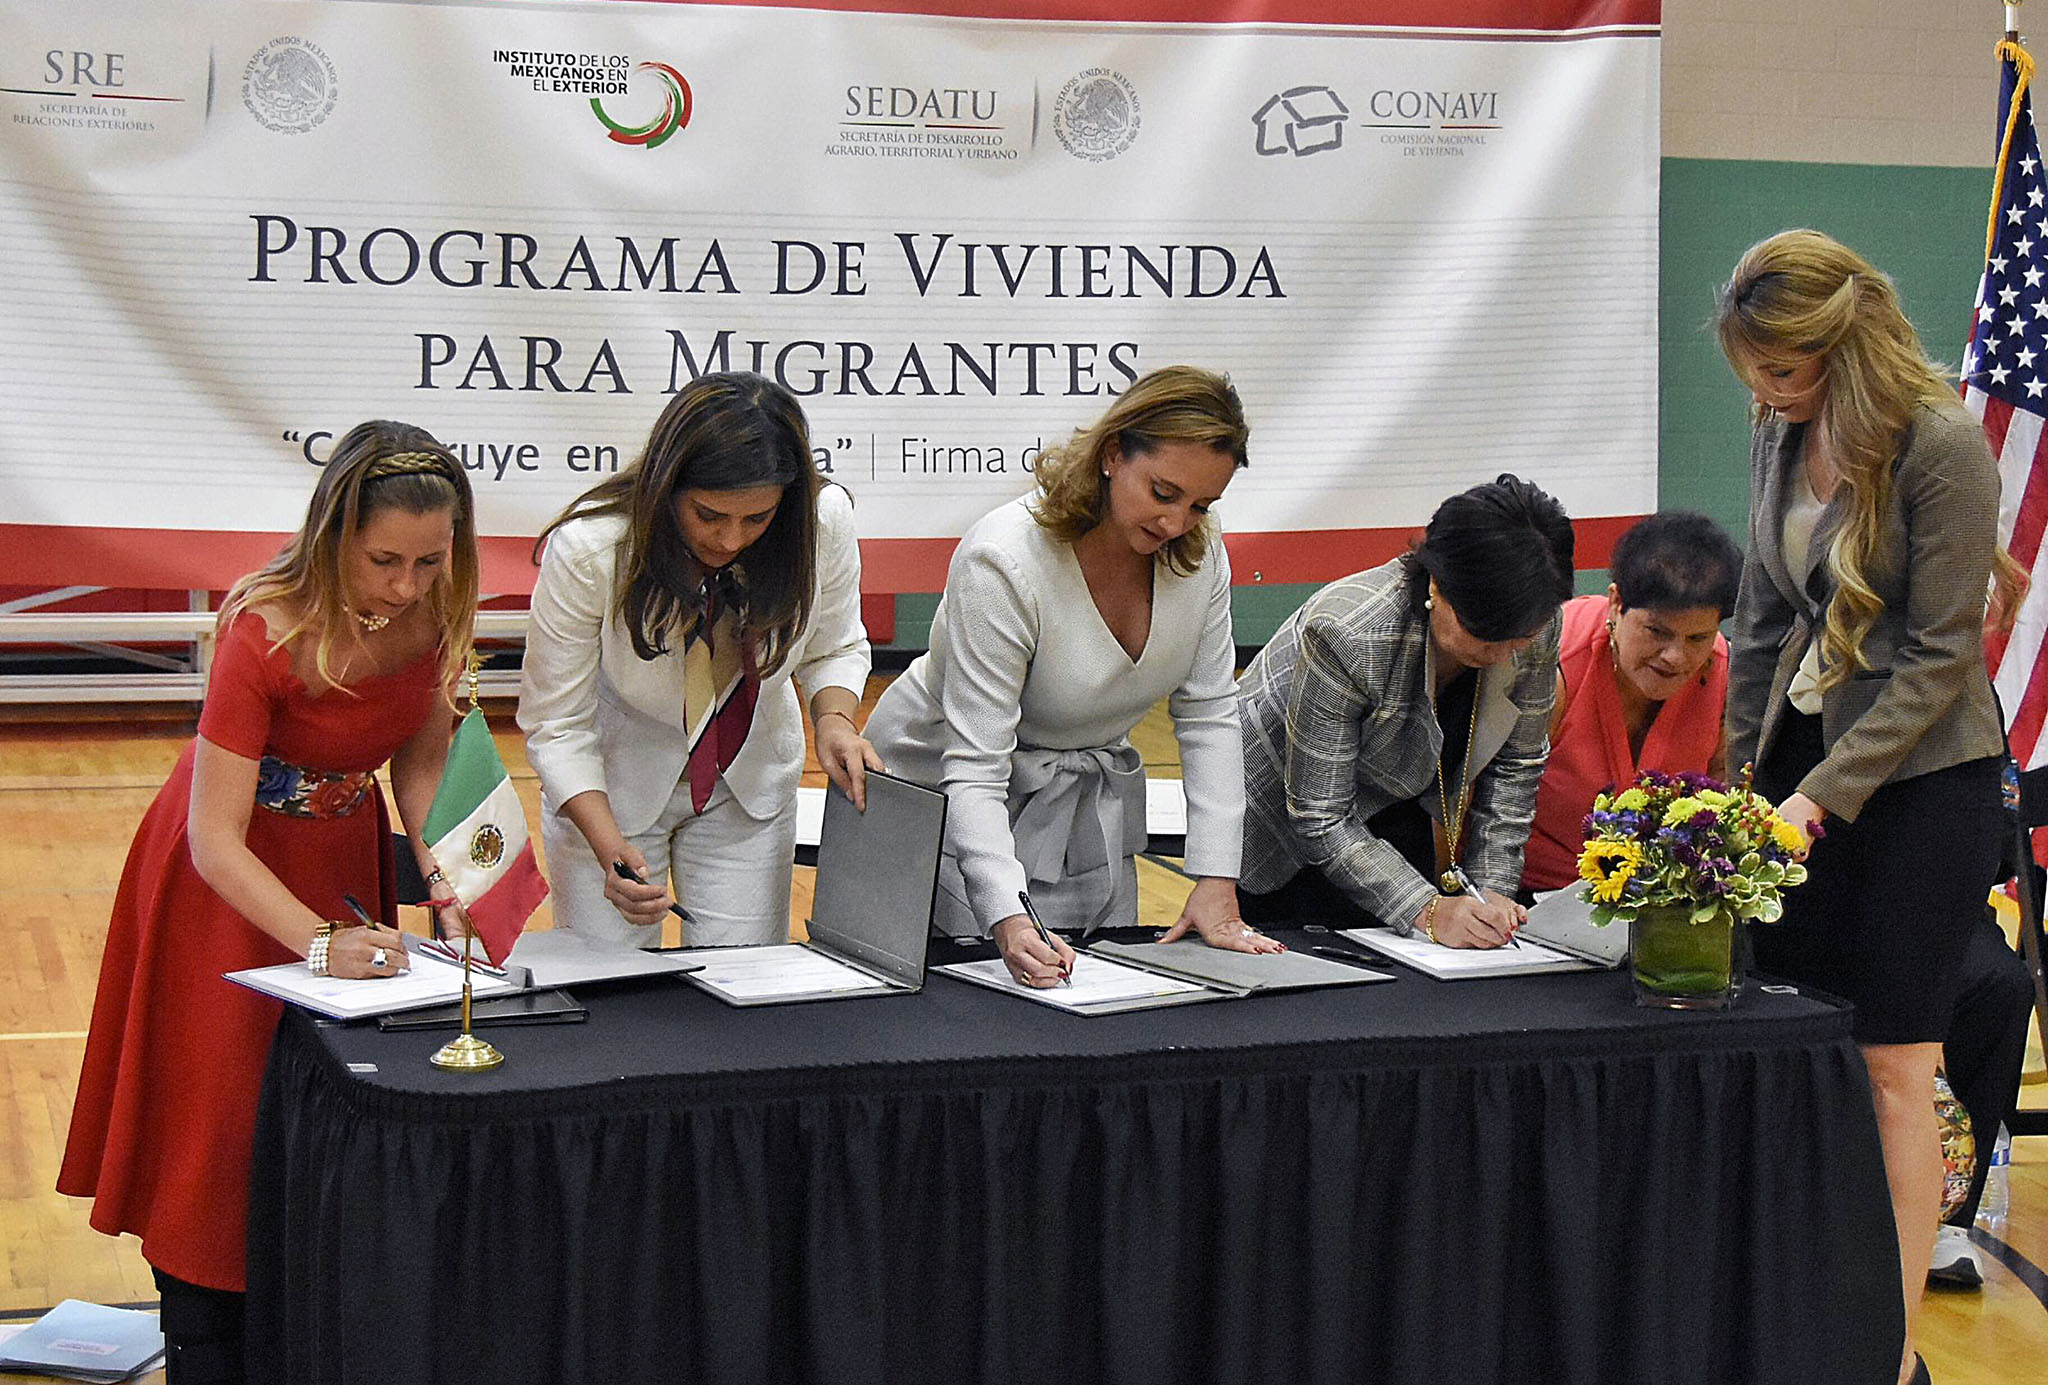 /cms/uploads/image/file/162800/FOTO_1_Programa_de_vivienda_para_migrantes-_Construye_en_tu_Tierra.jpg